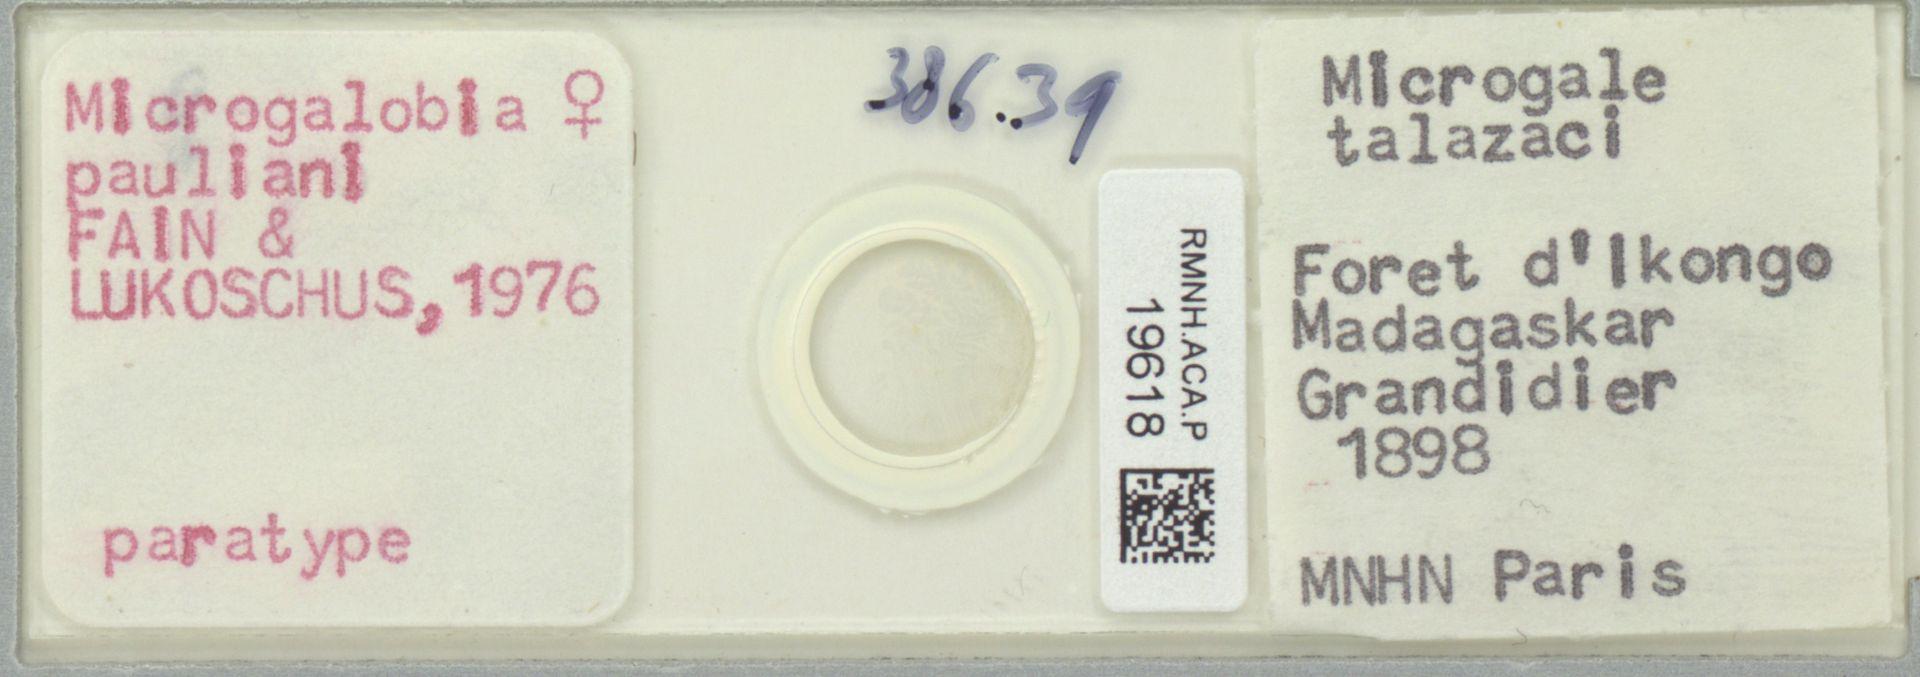 RMNH.ACA.P.19618 | Microgalobia pauliani